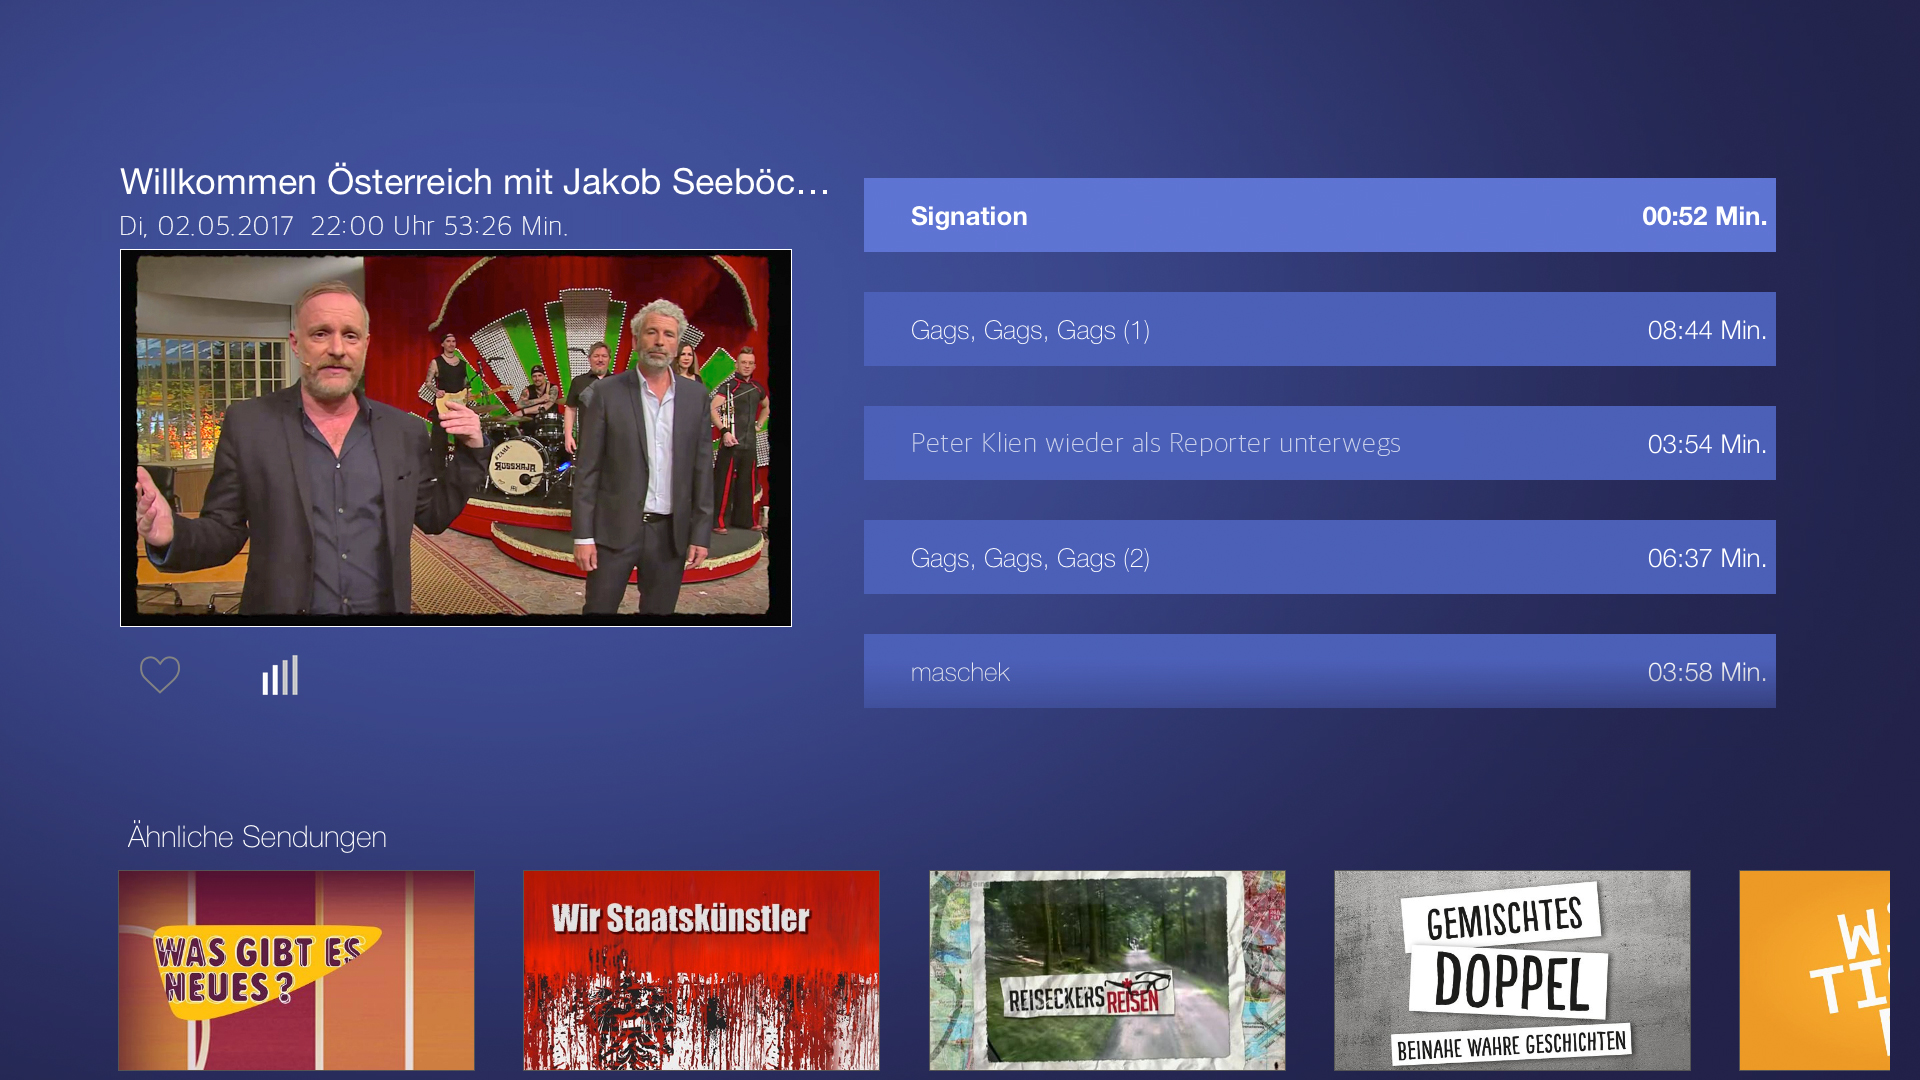 ORF-TVthek: Video on demand, live | Apps | 148Apps